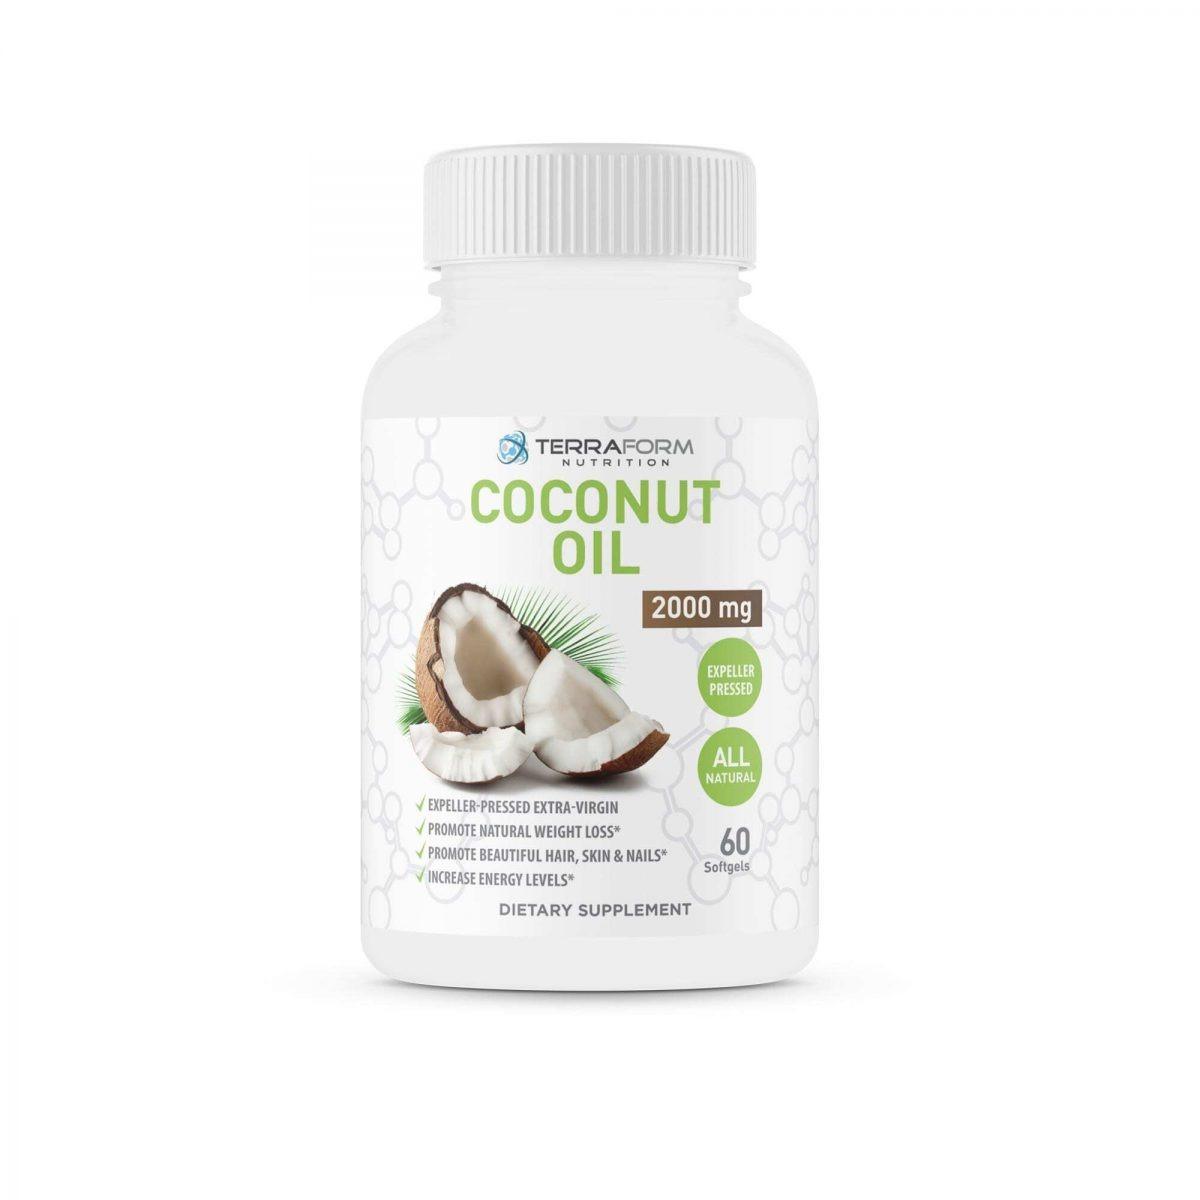 Coconut Oil Capsules - Extra Virgin Expeller-Pressed – 2000mg – 60 Softgels - TerraForm Nutrition-0